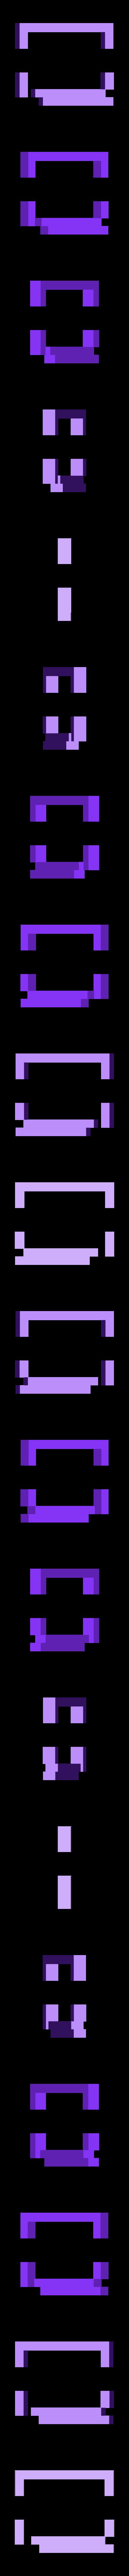 grey.stl Download STL file MMU QR code • 3D printing object, DoubekDesign